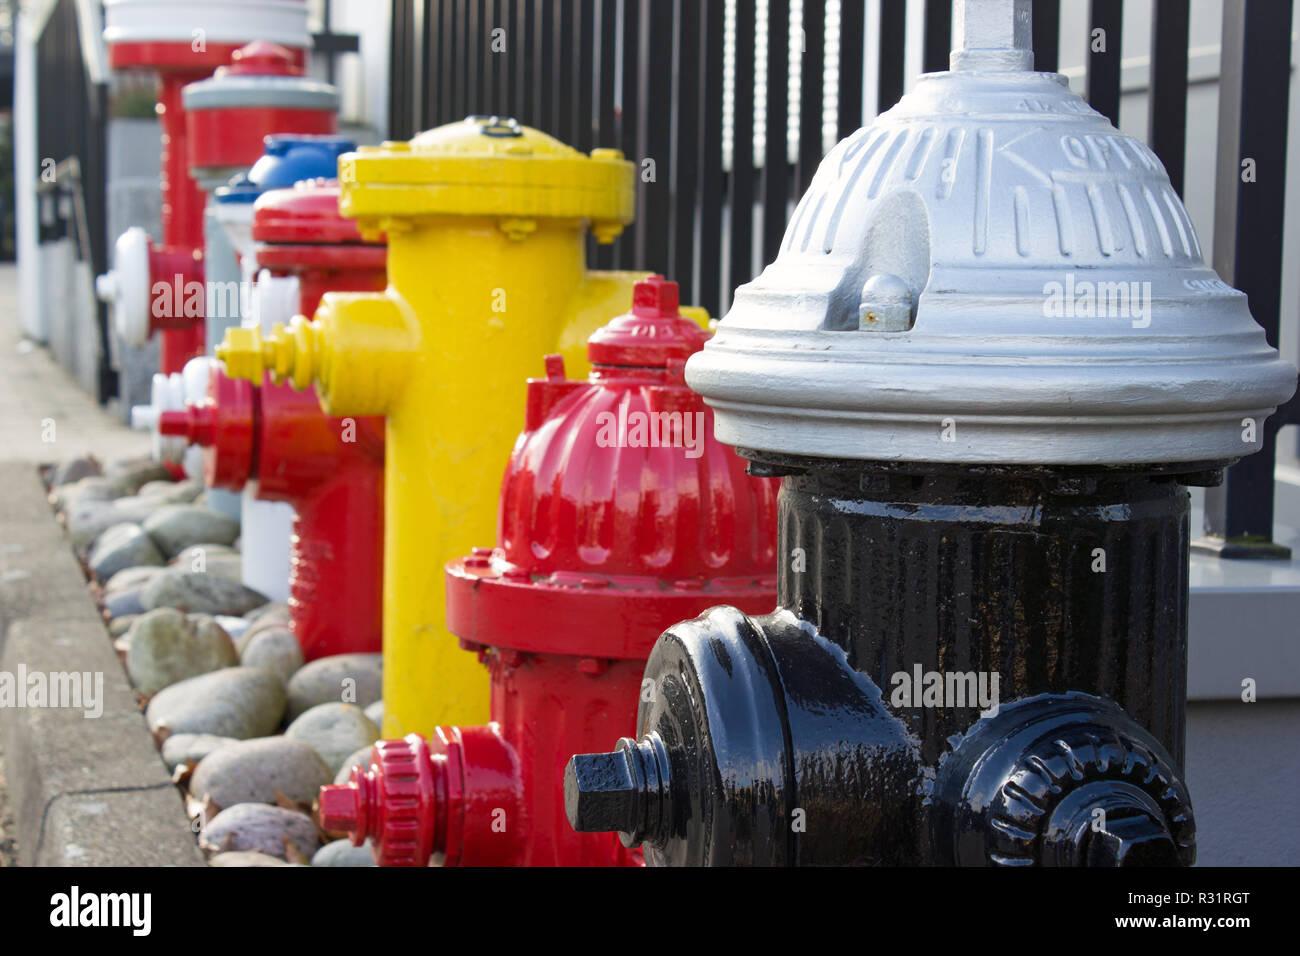 Bohrbrunnen Stock Photos Bohrbrunnen Stock Images Alamy